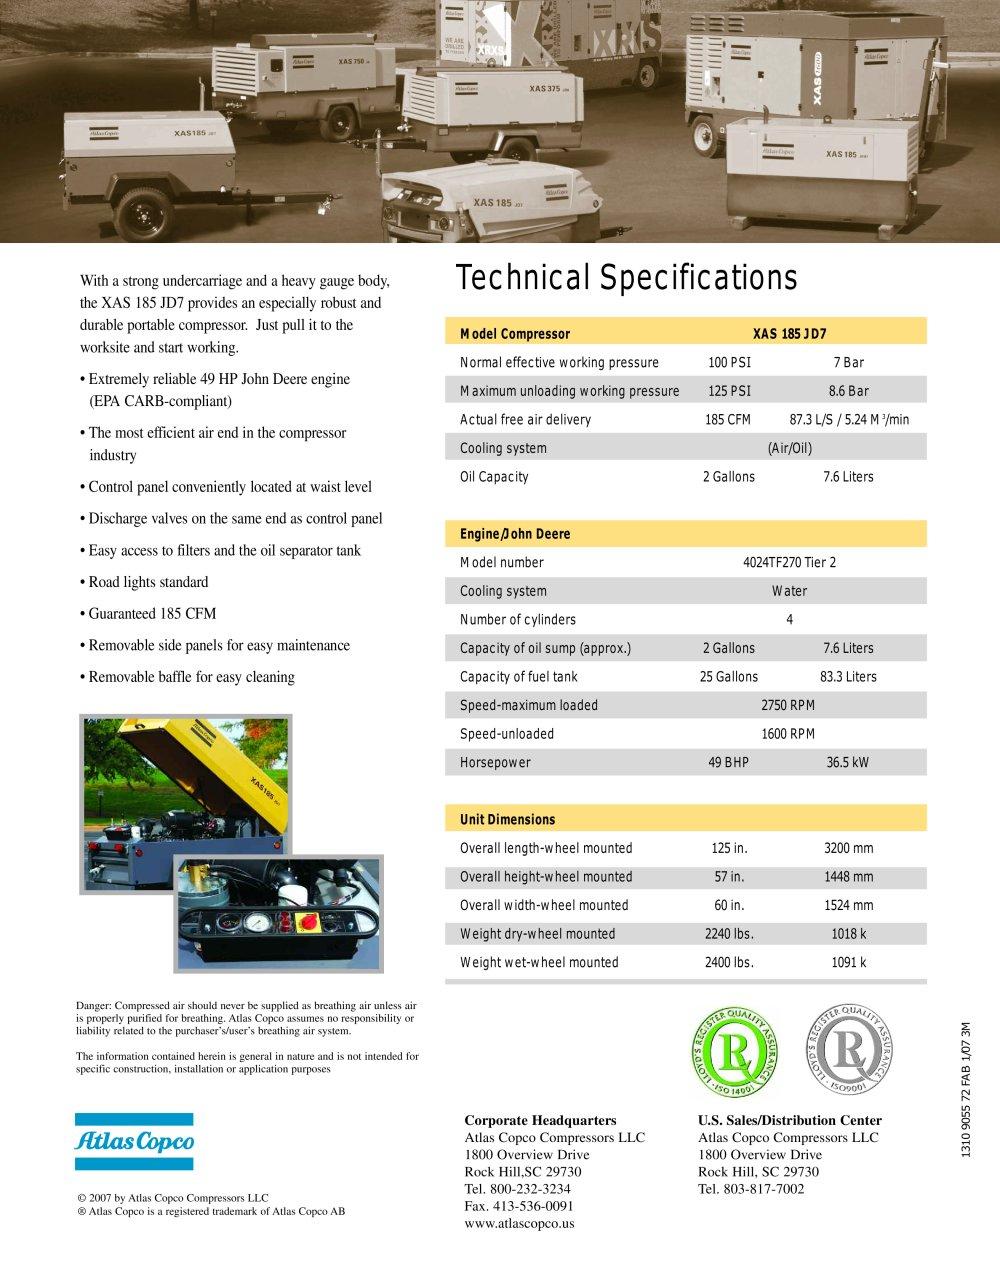 Atlas Copco Compressor Specifications Free Download 1600 Wiring Diagram Automotive News At